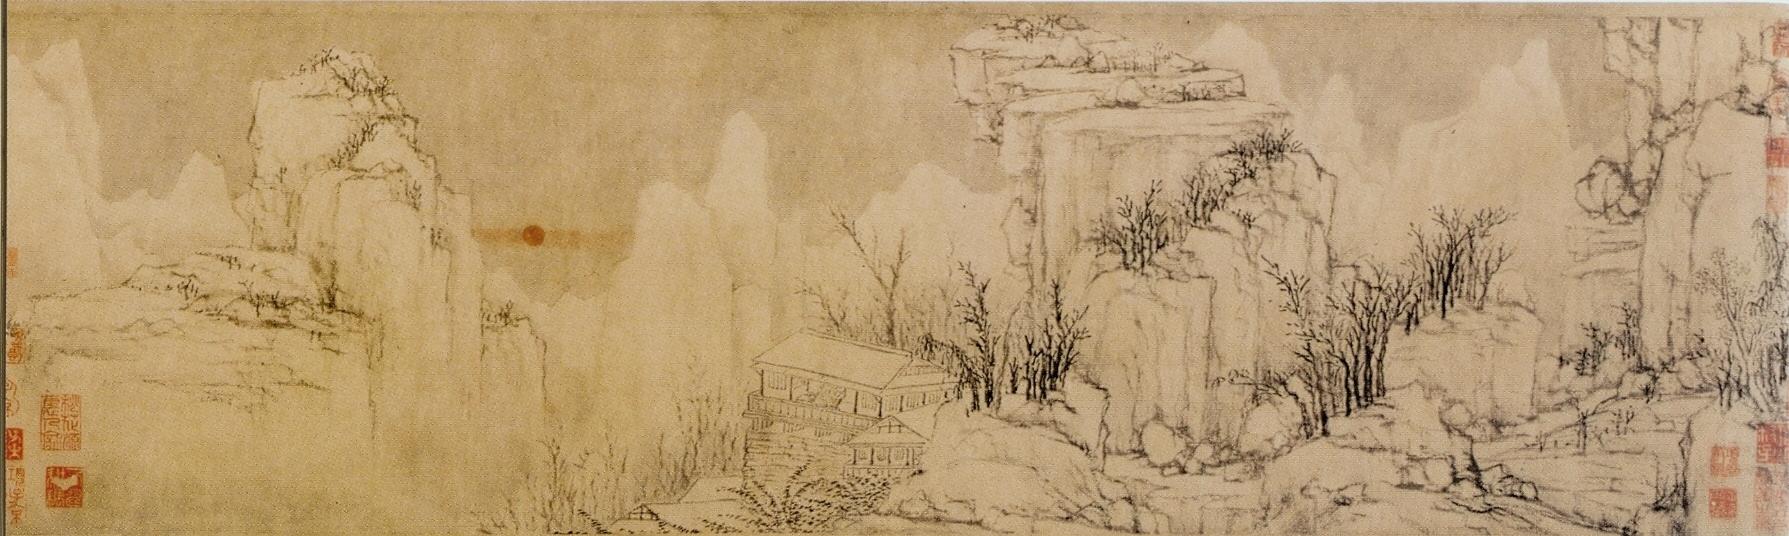 Huang_Gongwang._Clearing_After_Sudden_Snow._ca._1340._104,6_cm_long.Palace_Museum,_Beijing.jpg